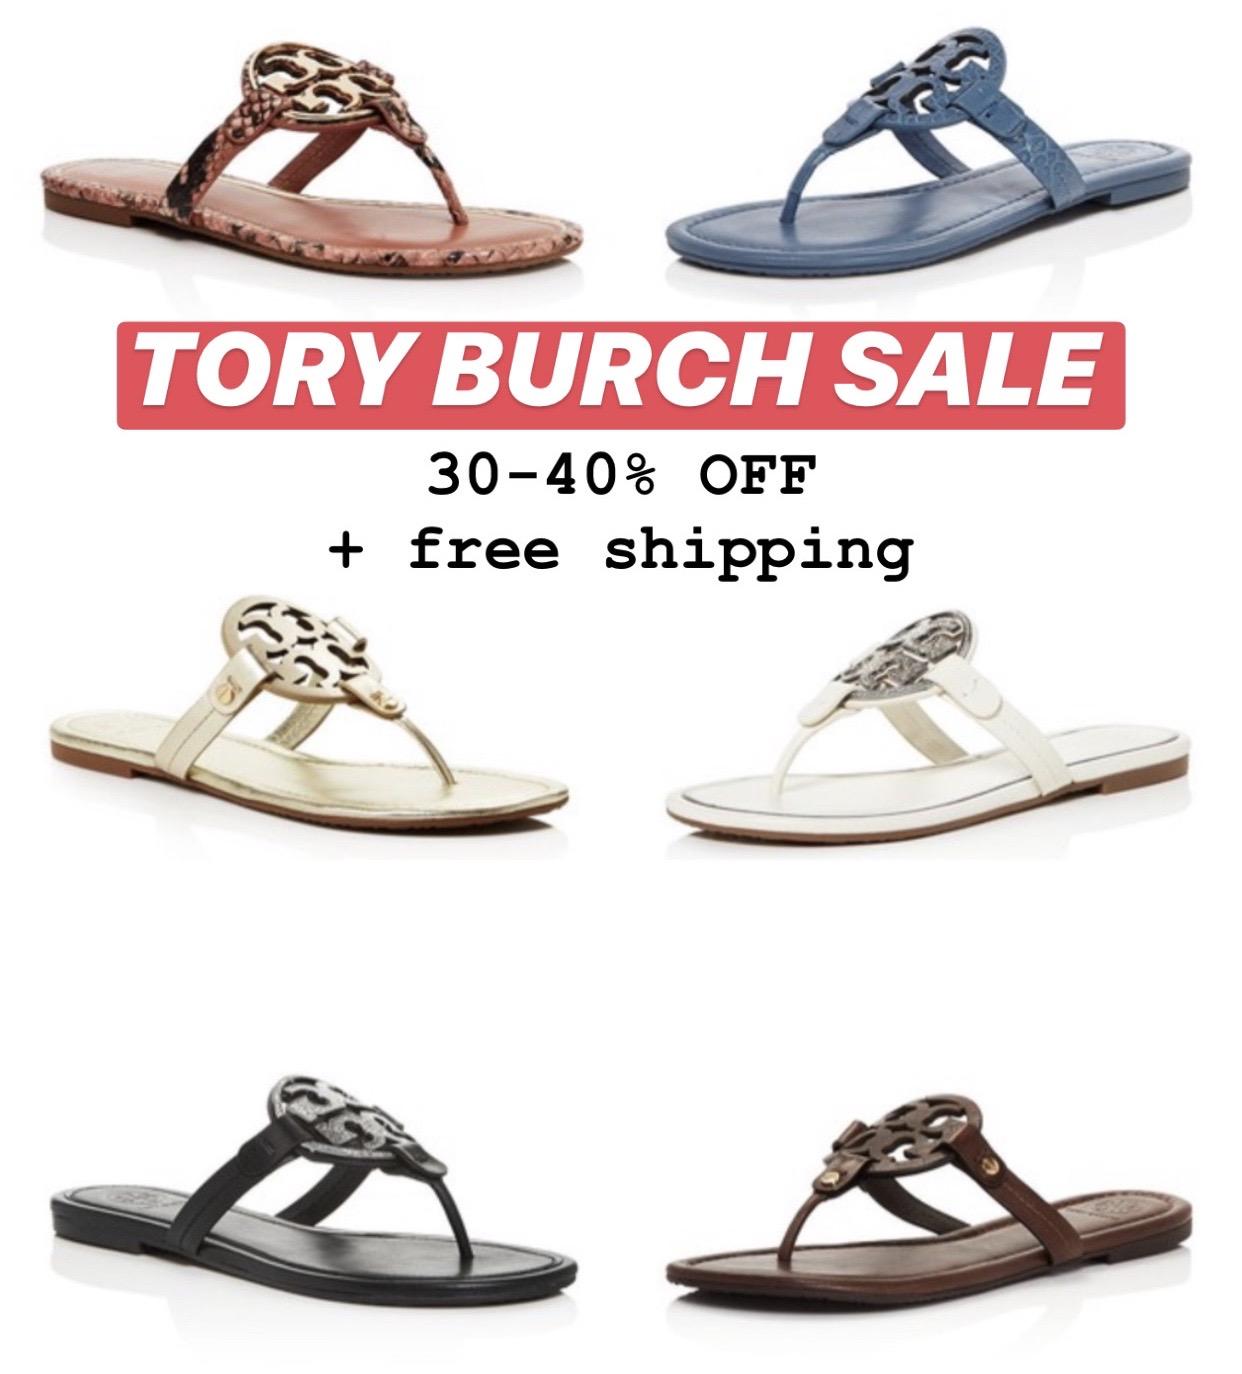 tory burch miller sale